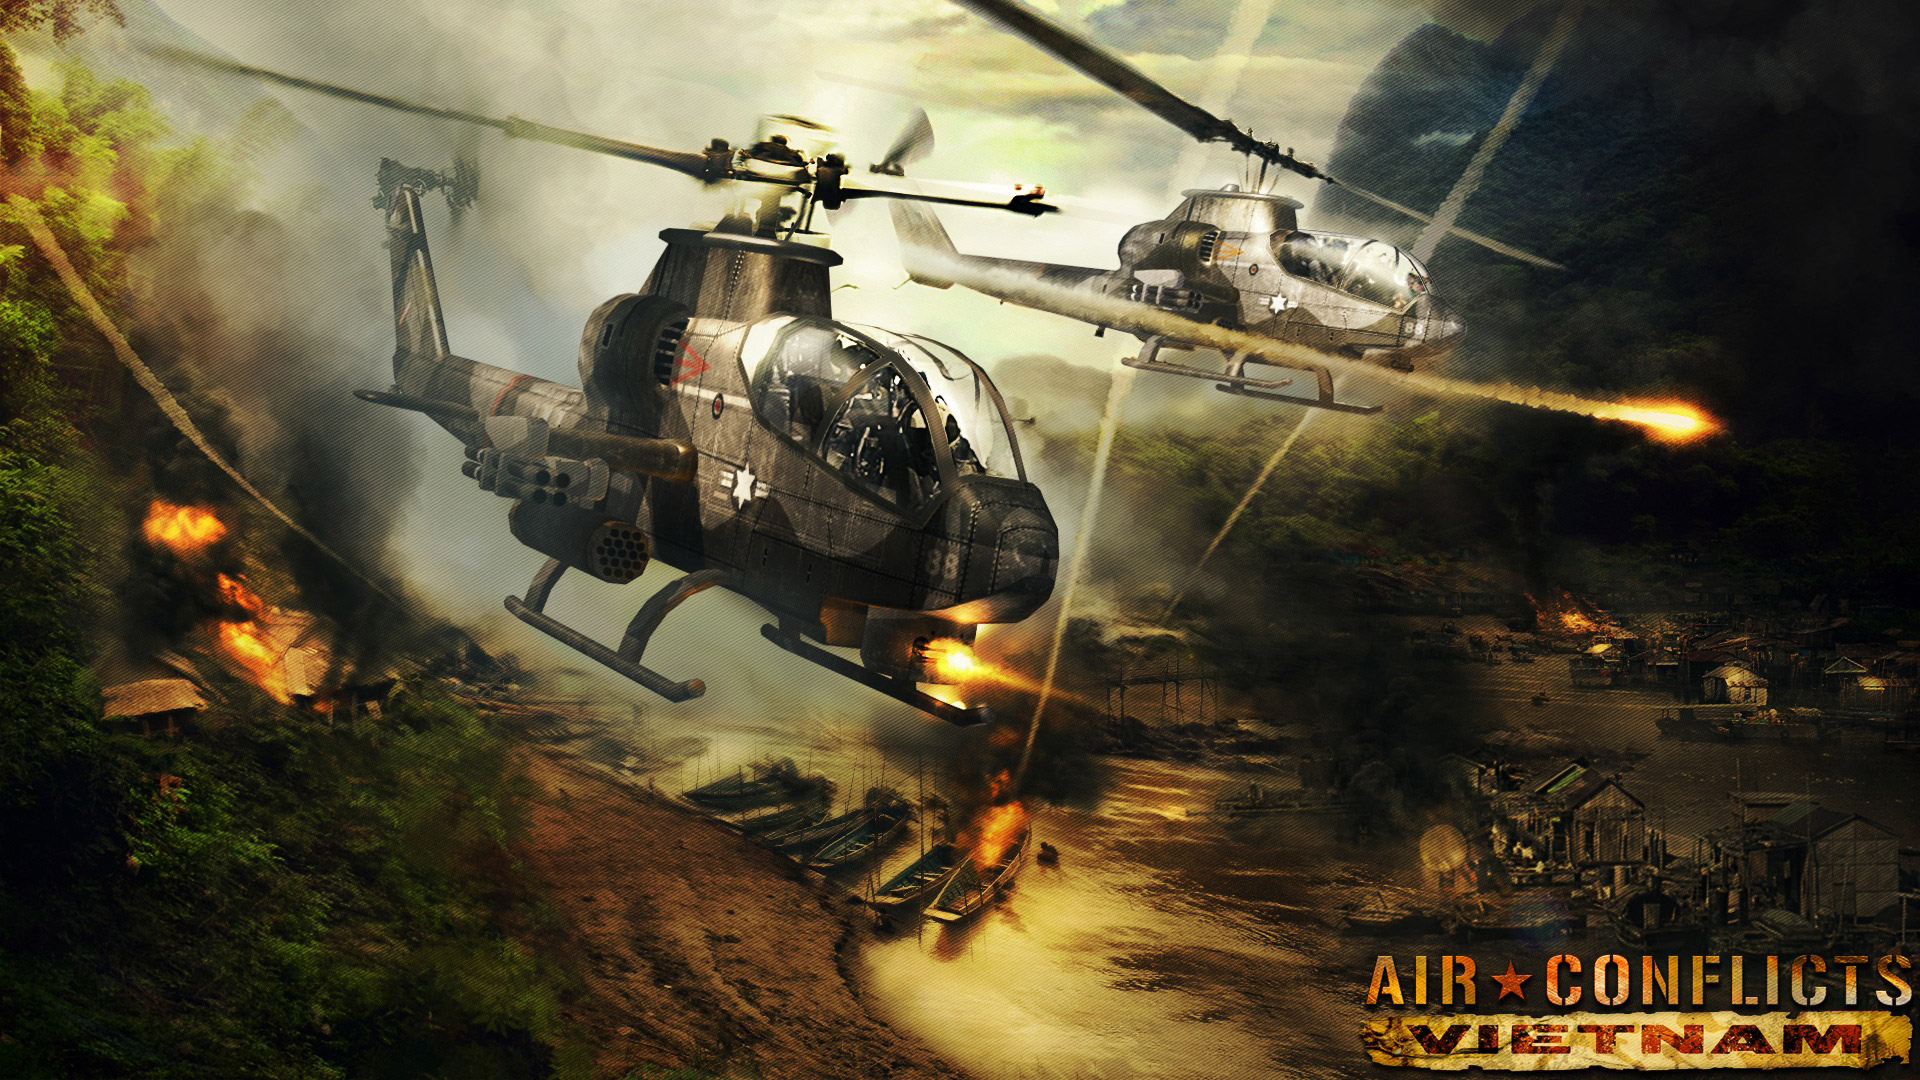 Air Conflicts: Vietnam Wallpaper in 1920x1080